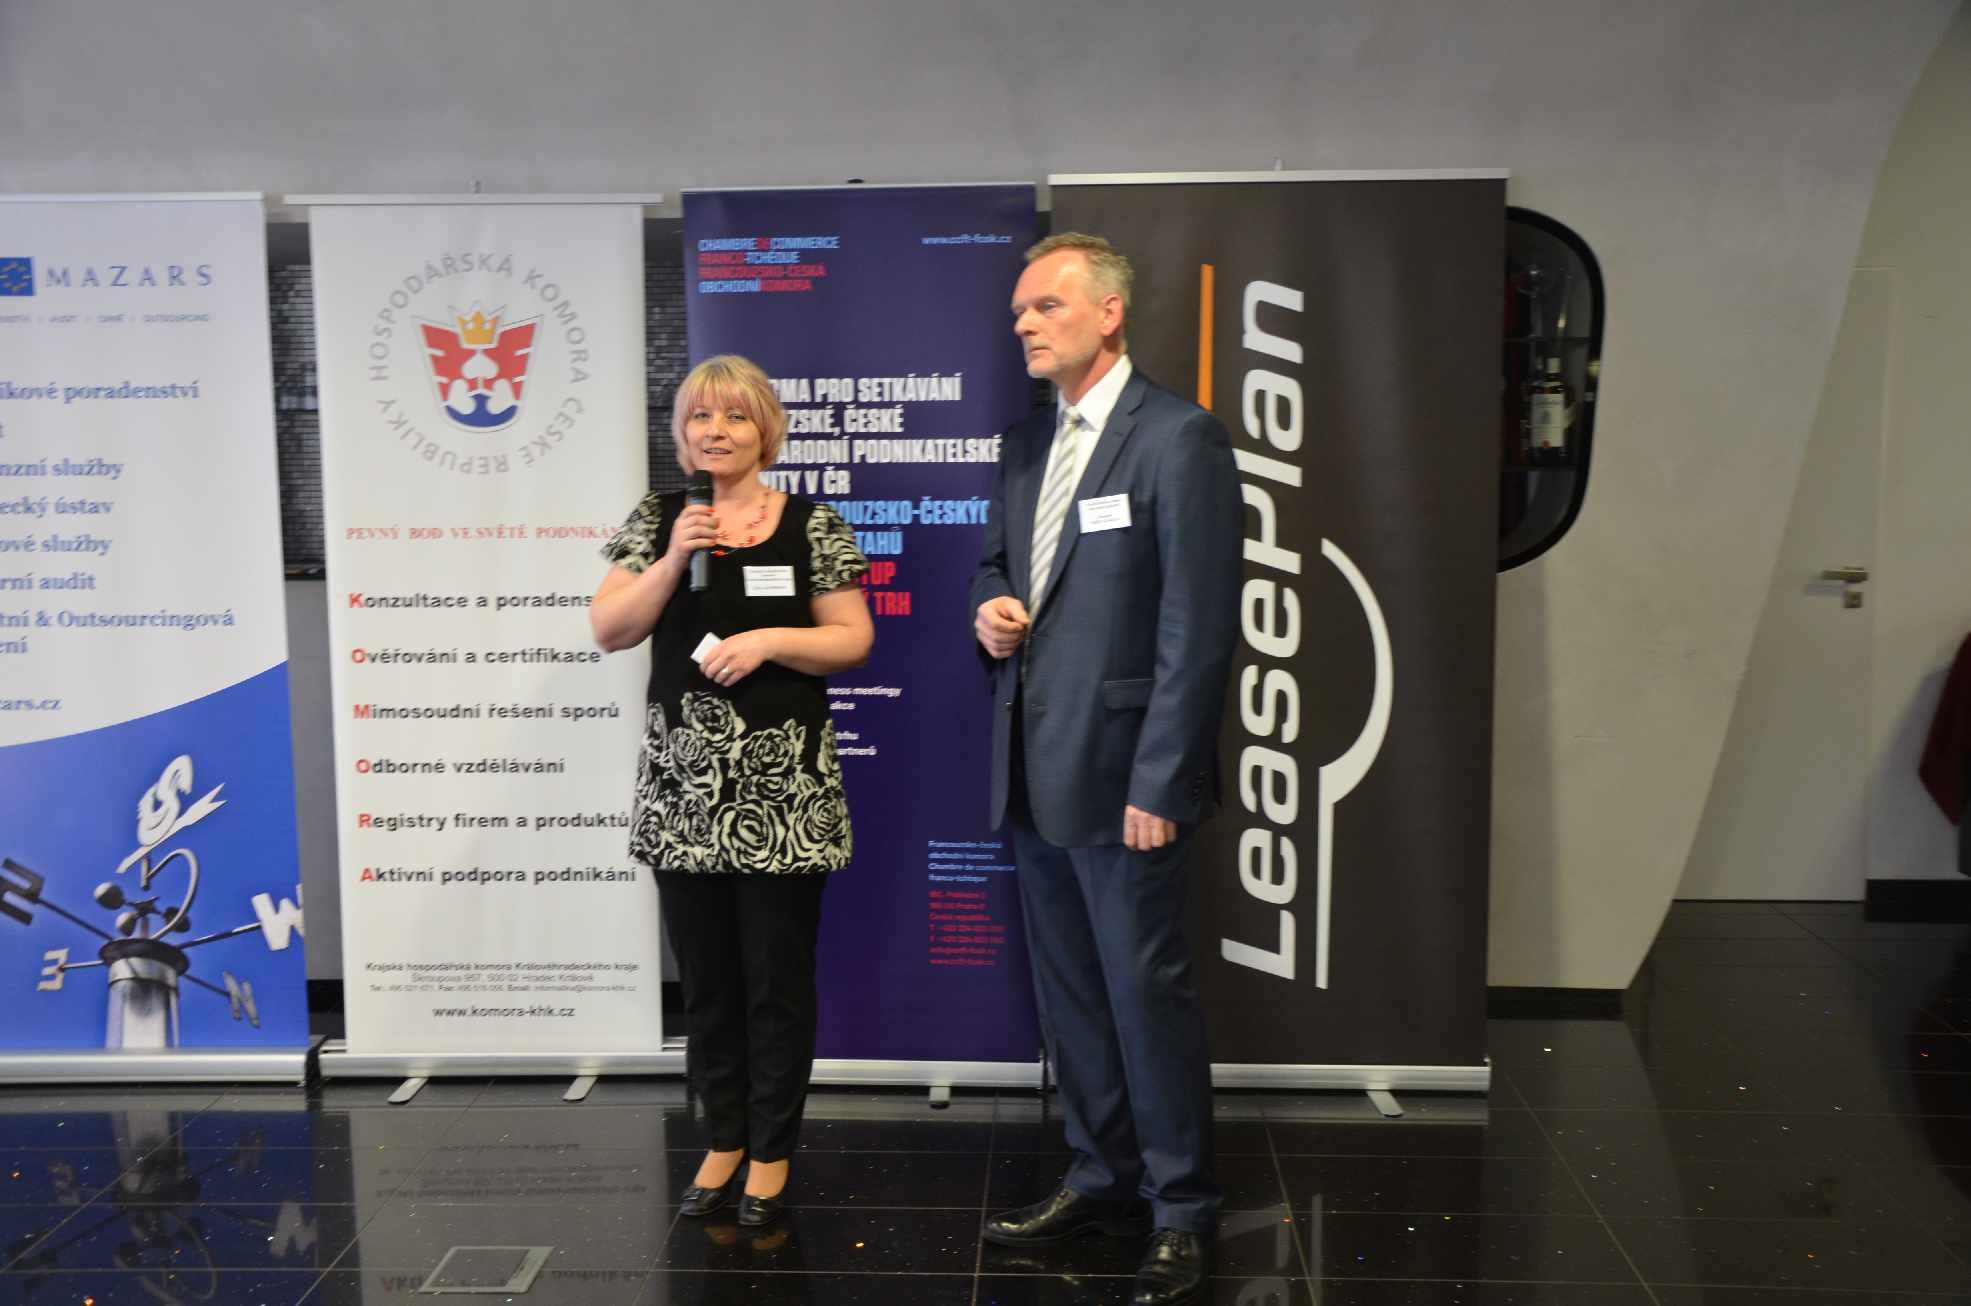 Galerie de photos : Speed Business Meeting à Hradec Králové